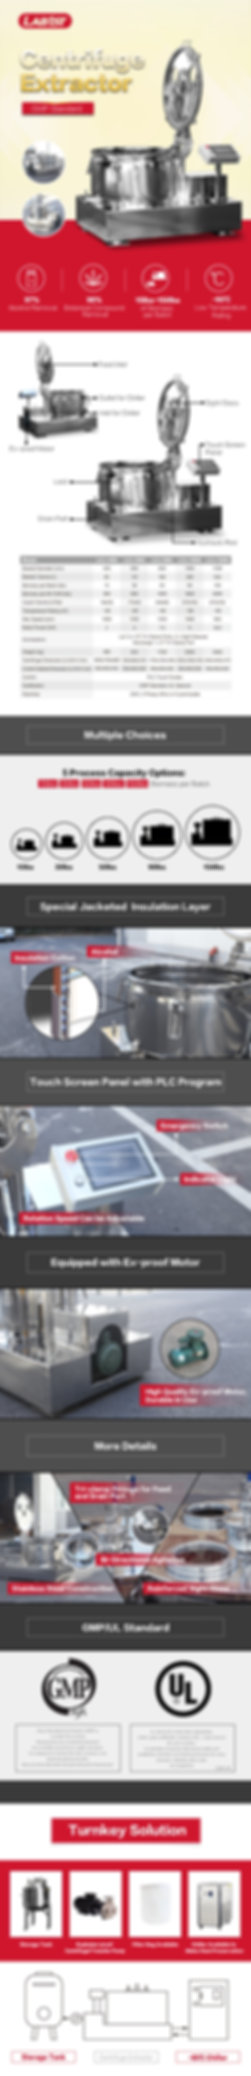 LXJ-Red_centrifuge extractor.jpg